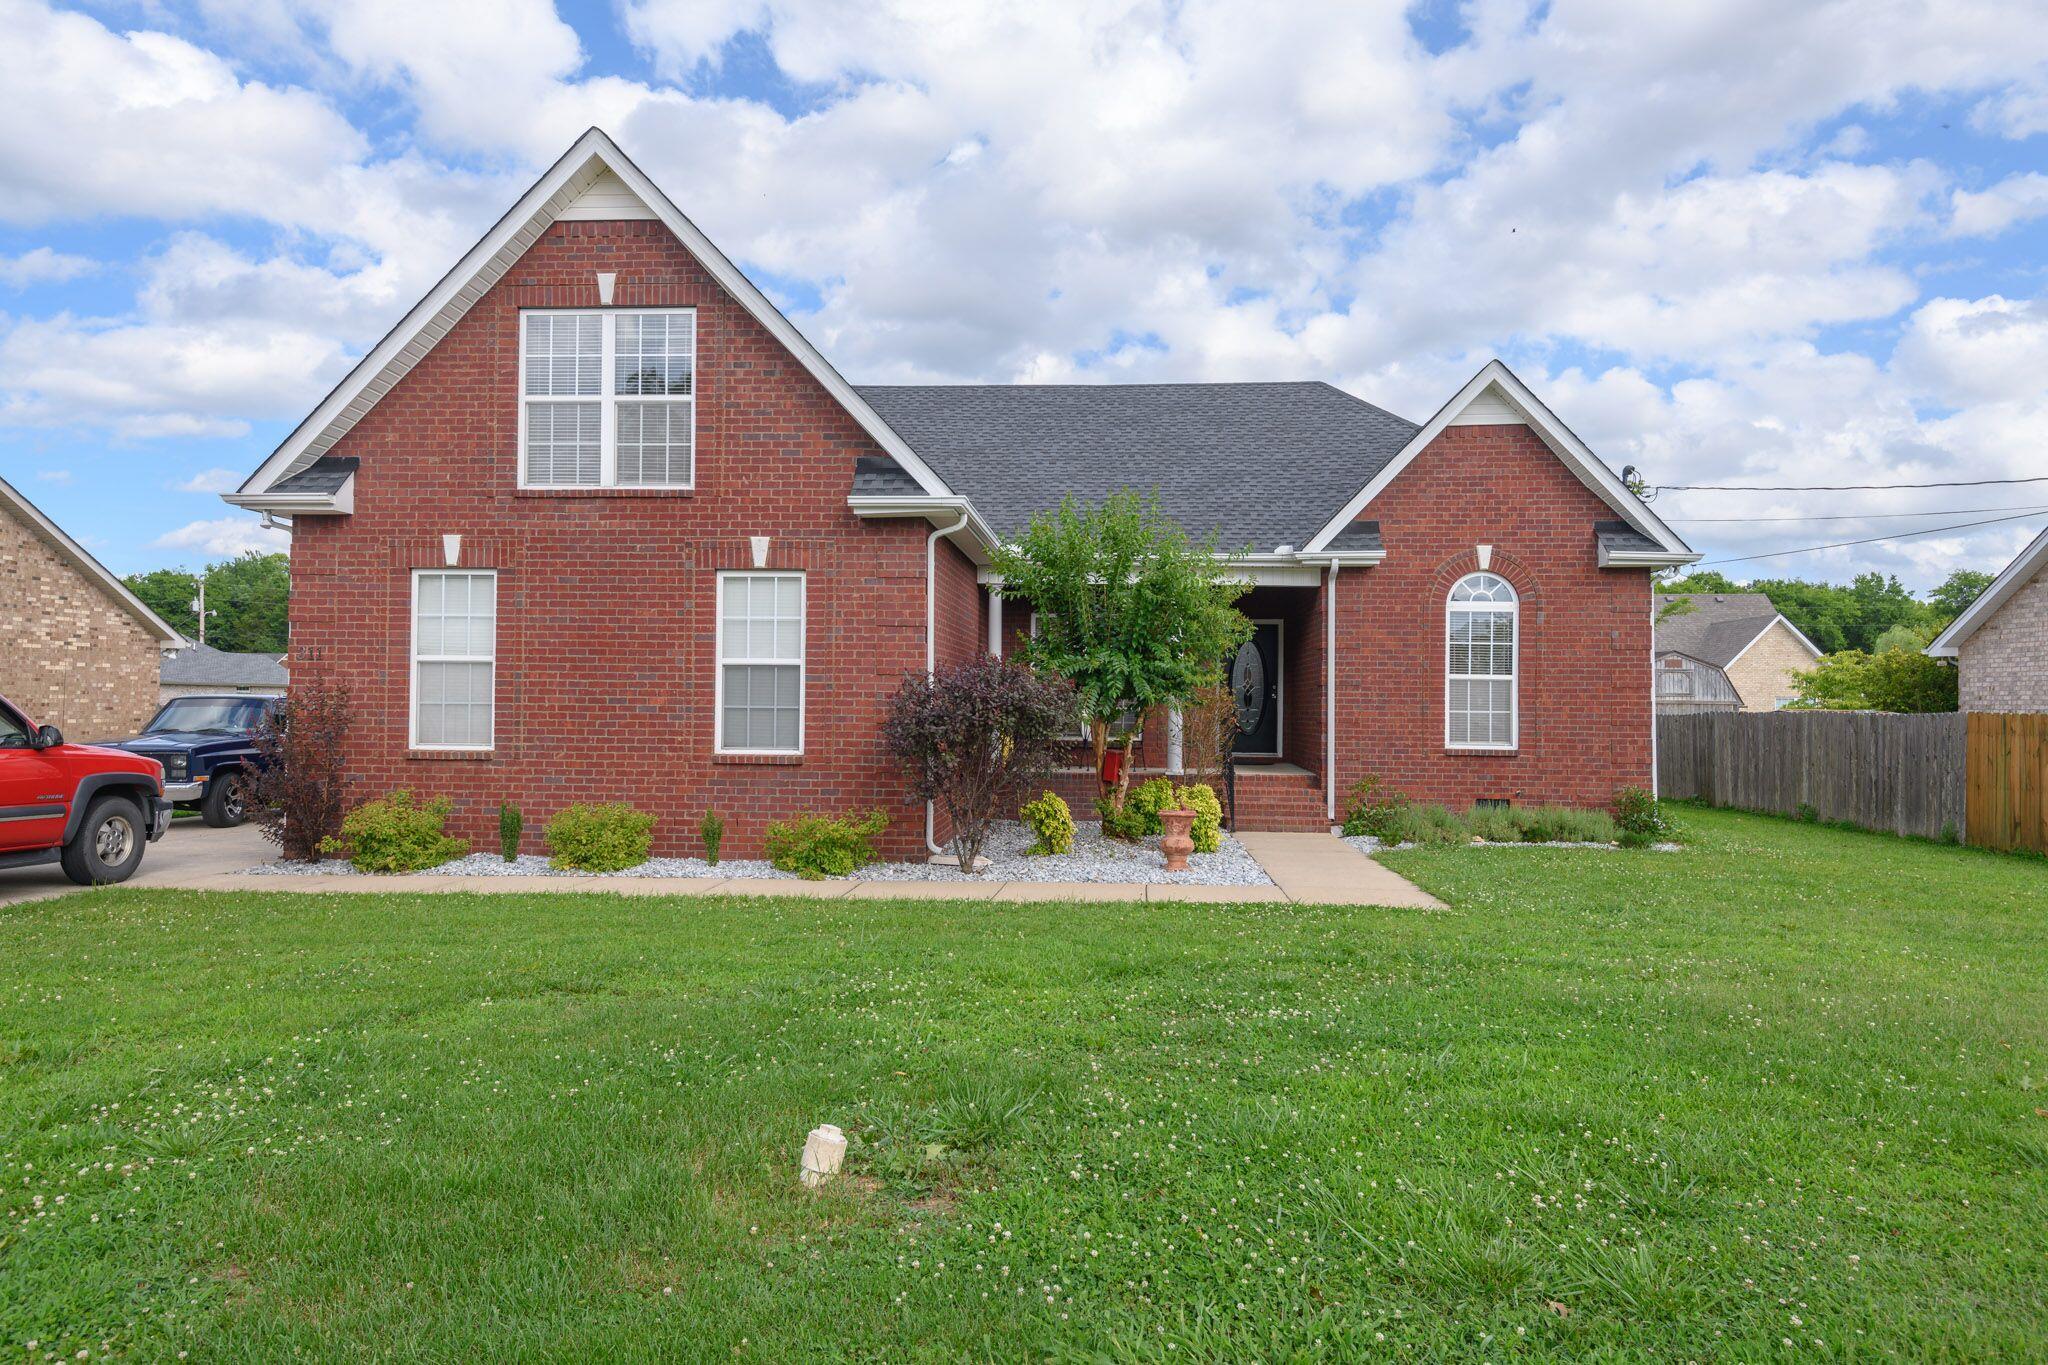 311 Shelby Circle, Shelbyville, TN 37160 - Shelbyville, TN real estate listing